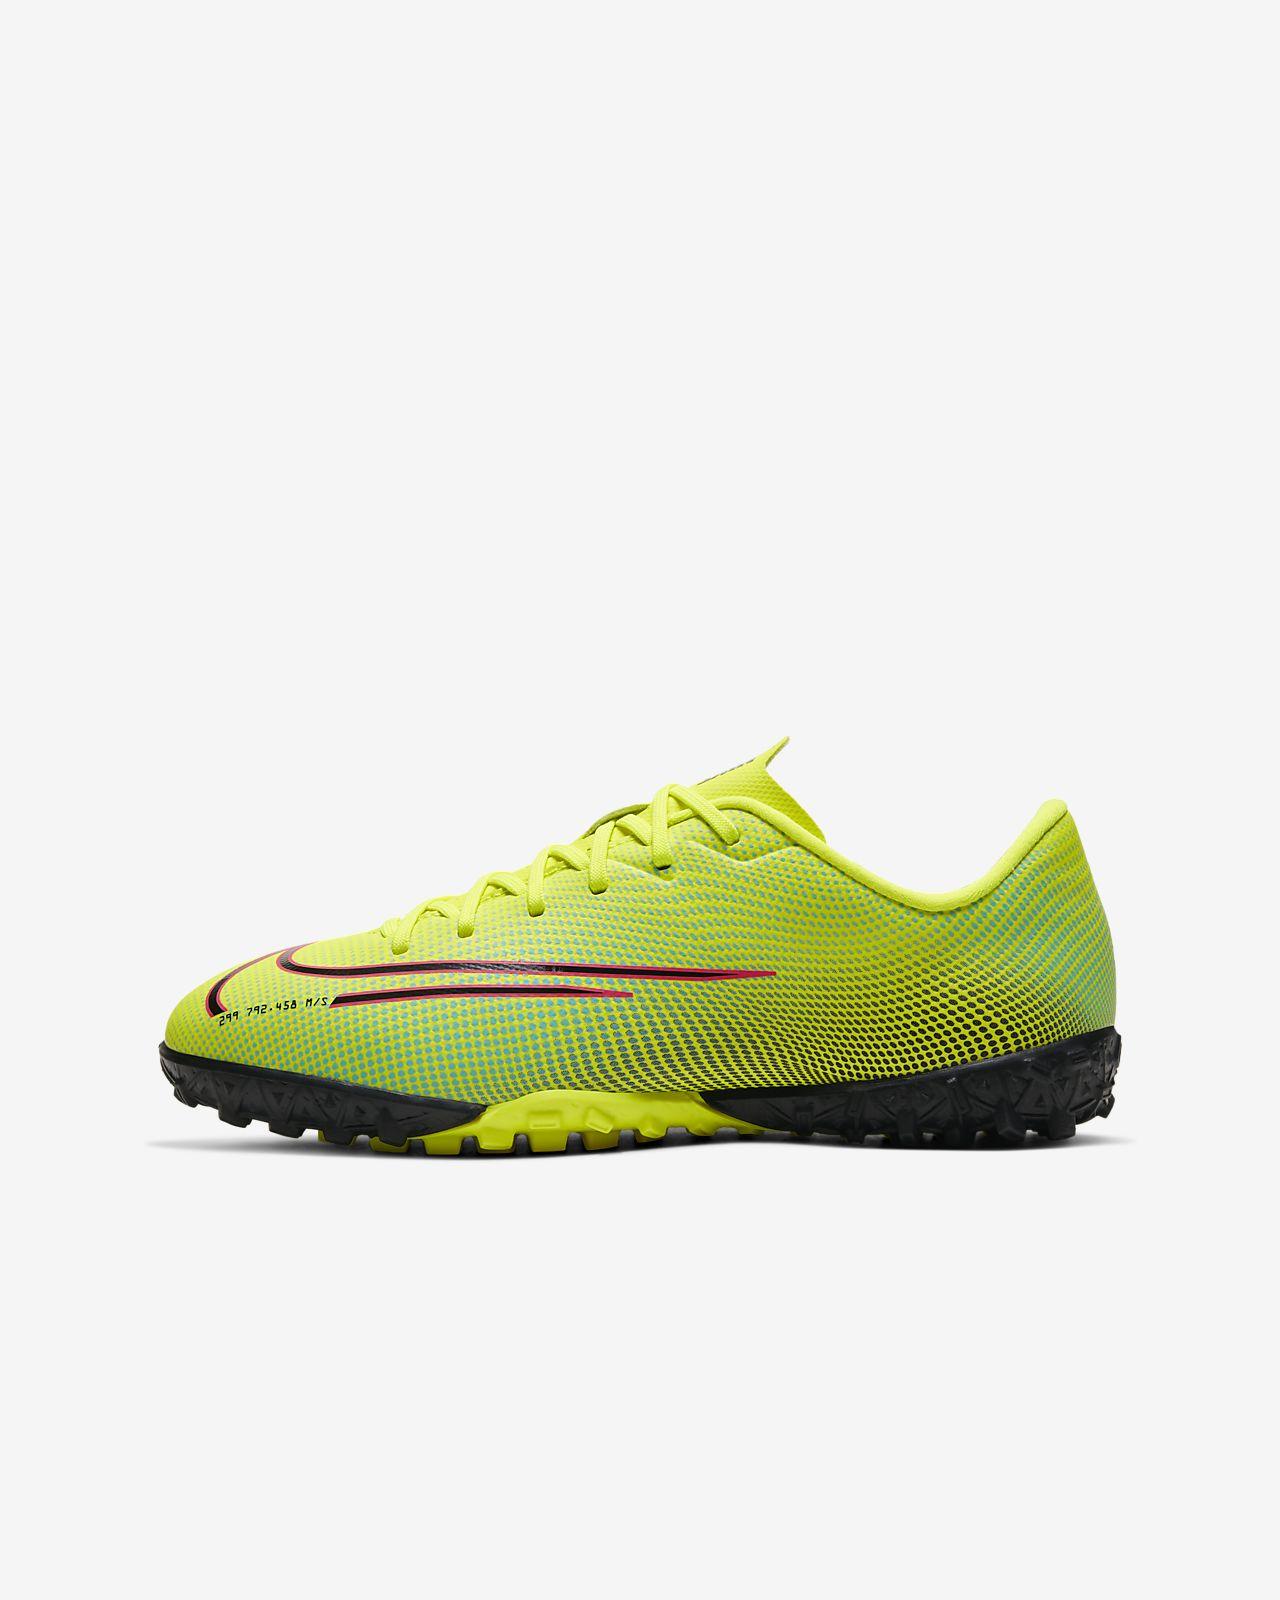 Nike Jr. Mercurial Vapor 13 Academy MDS TF Younger/Older Kids' Artificial-Turf Football Shoe